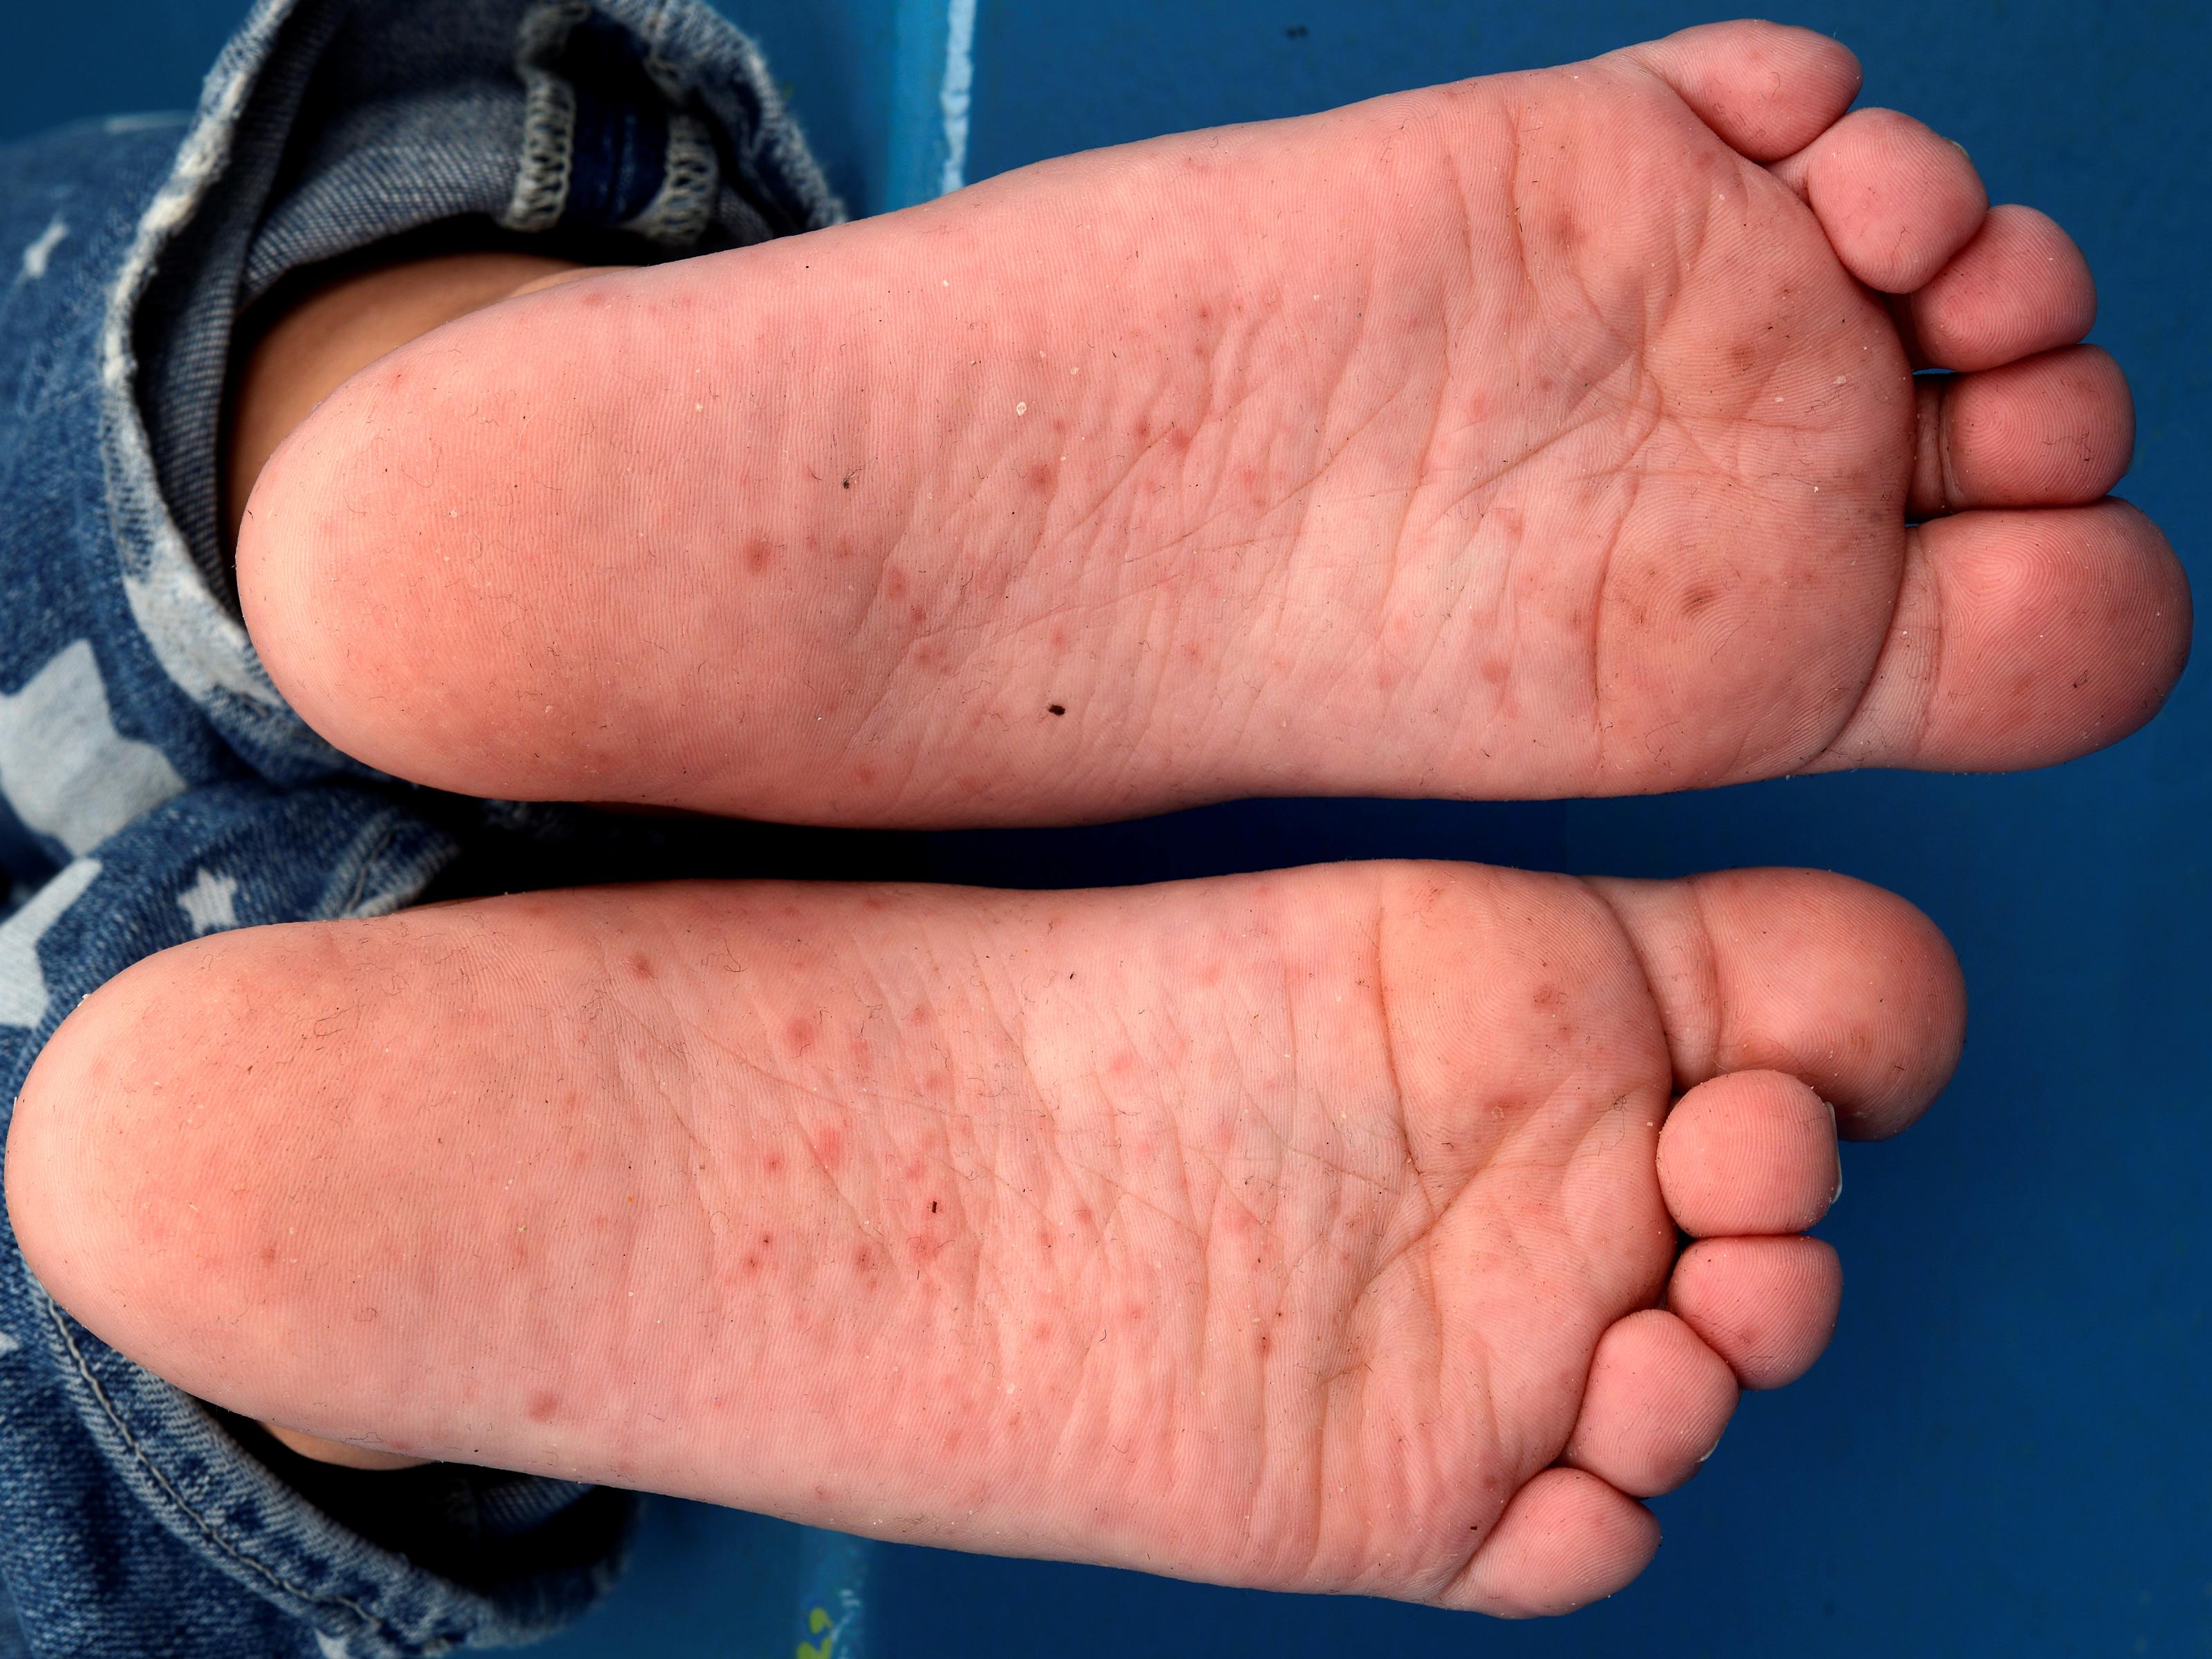 Erysipelas - Pictures, Causes, Treatment, Symptoms